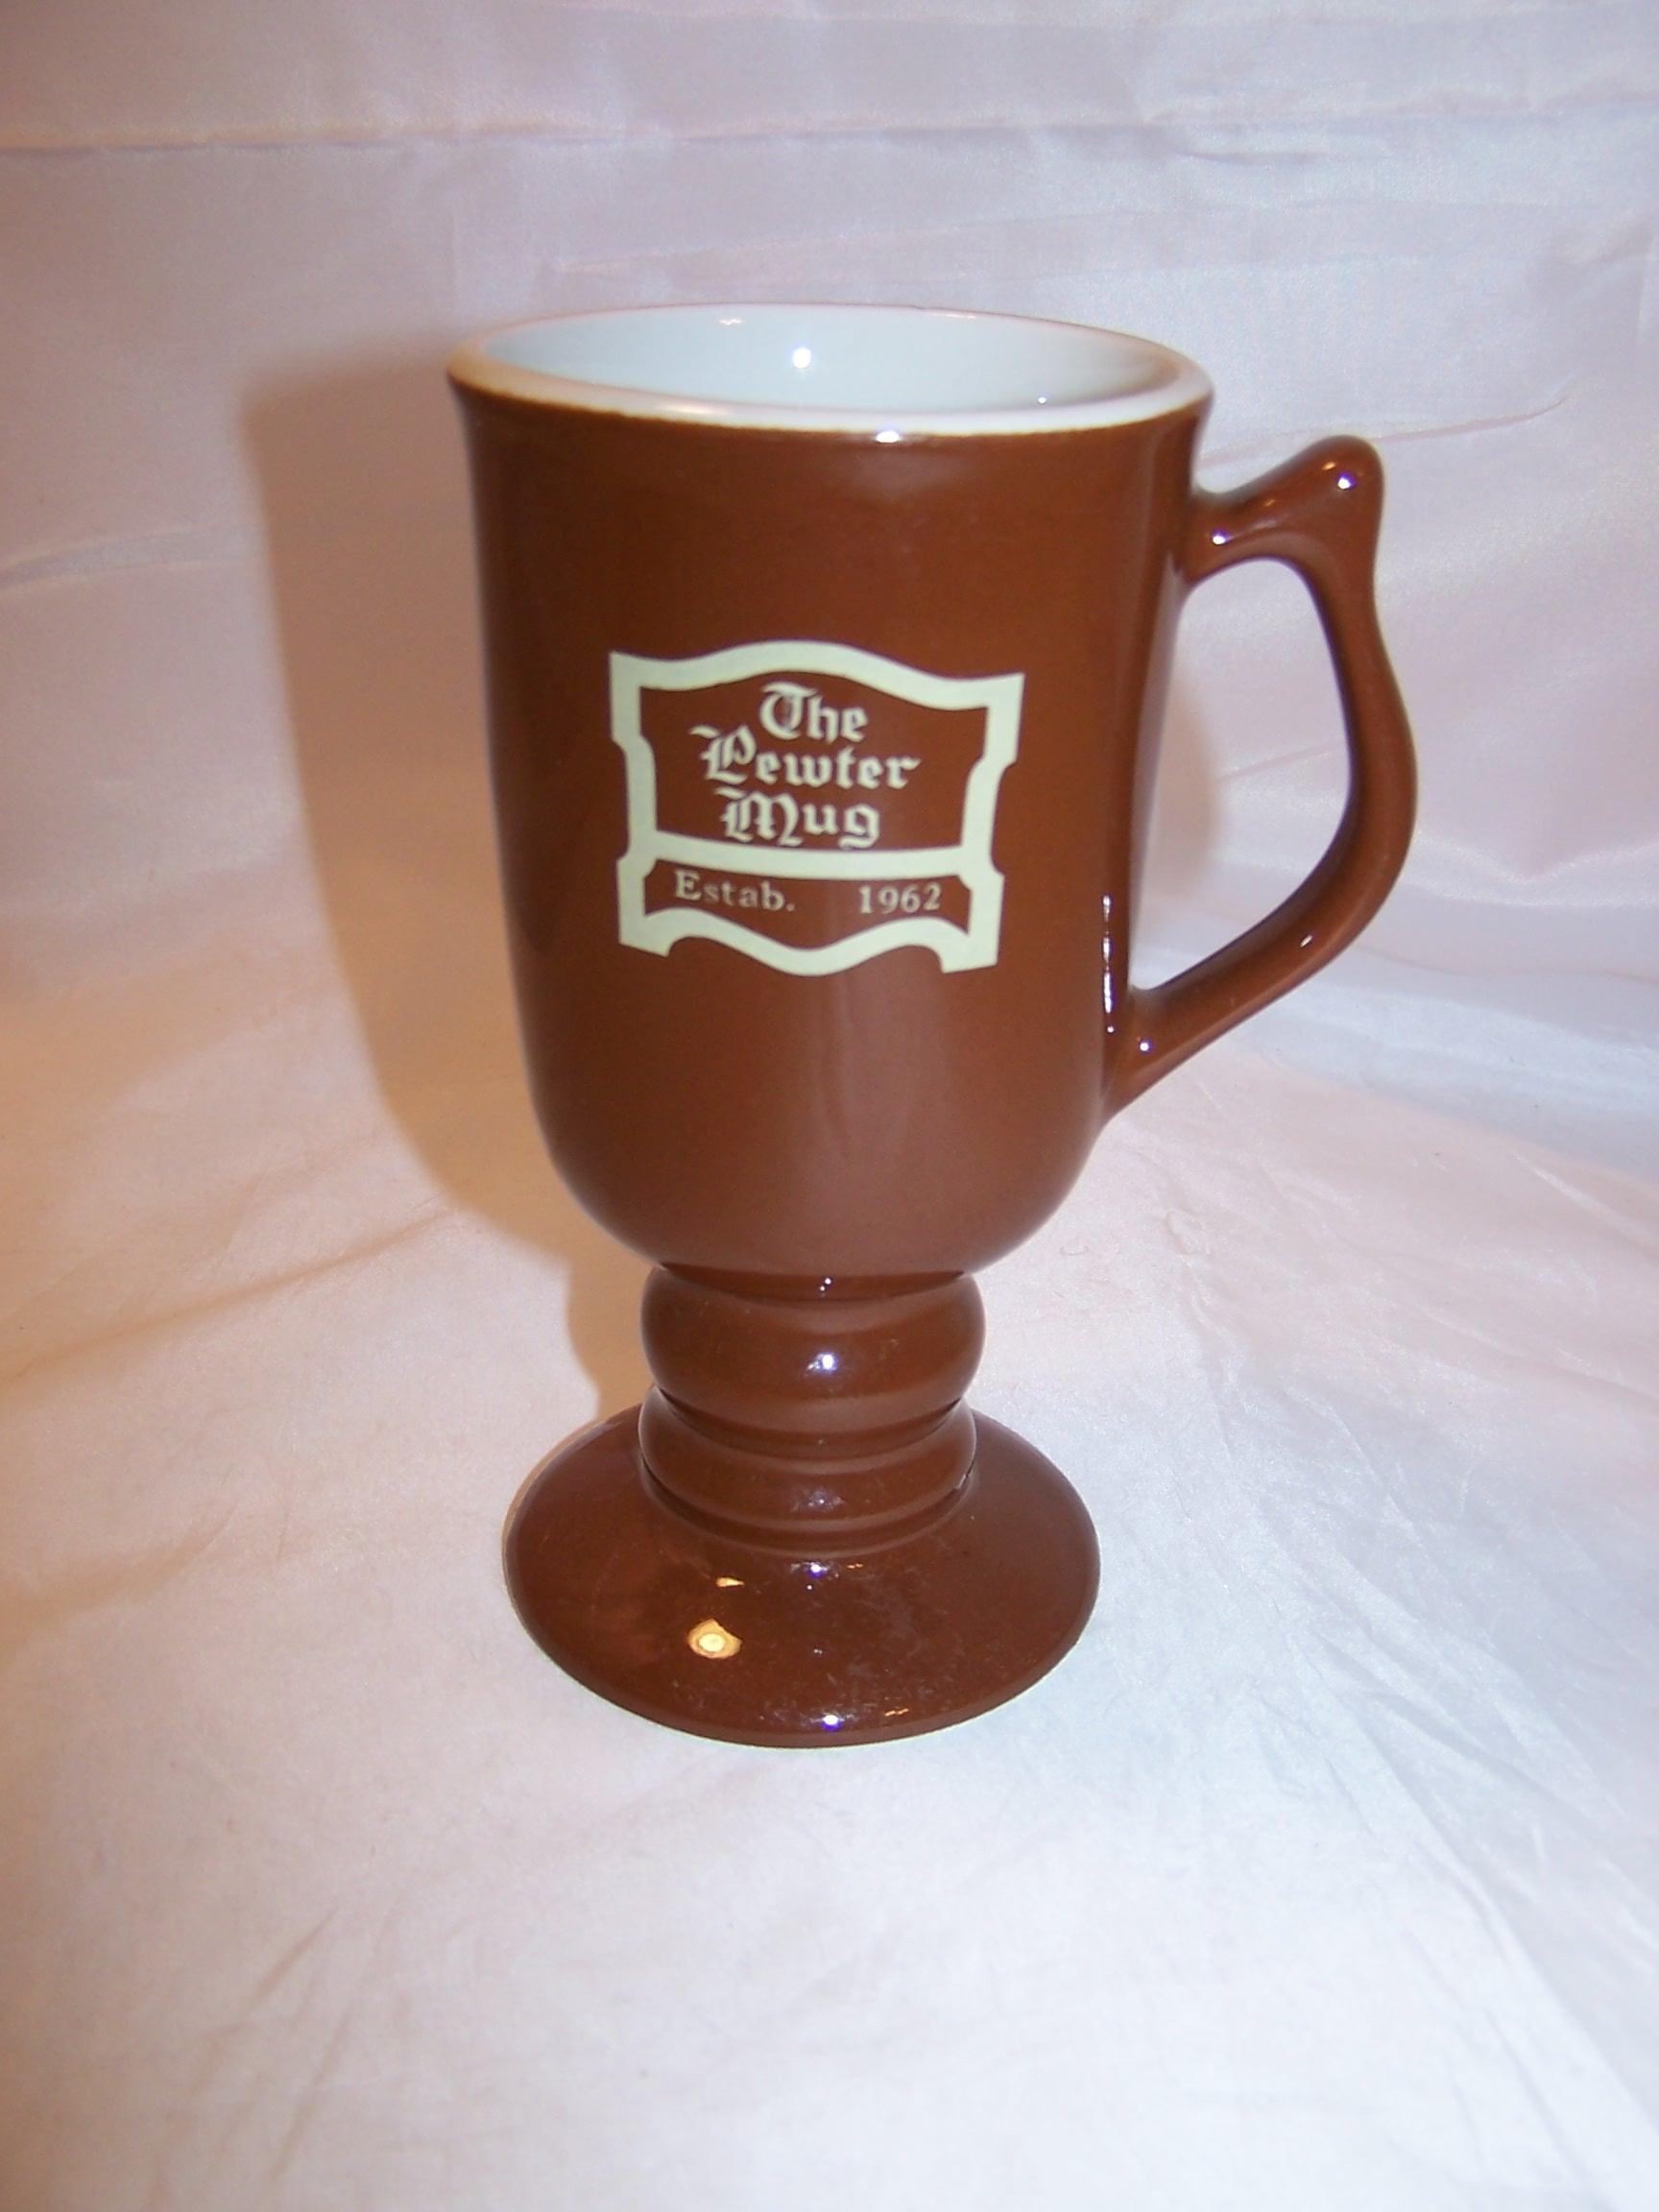 Art Modell Mug, The Pewter Mug